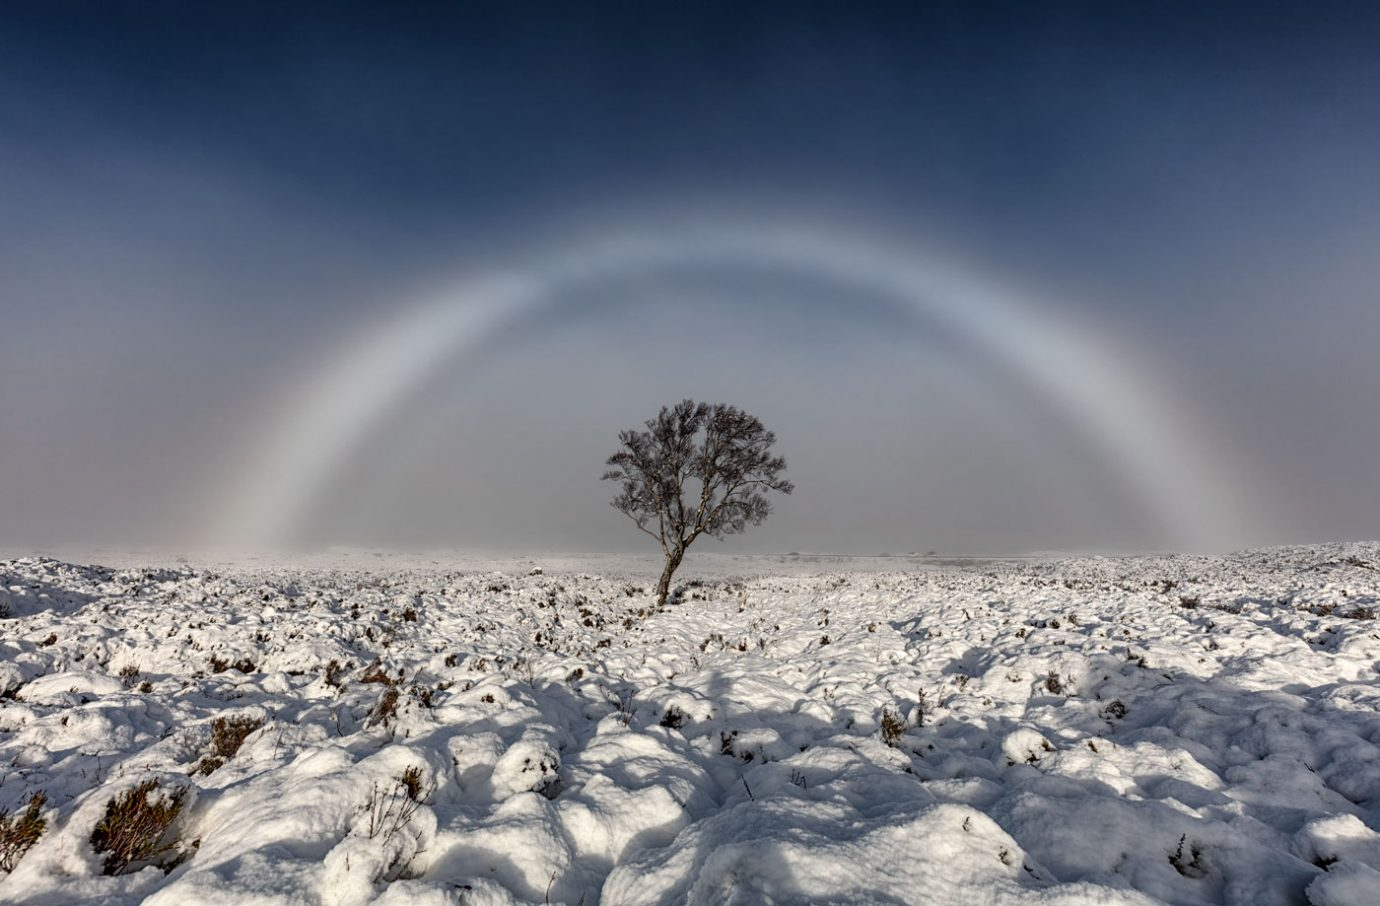 Fogbow, Rannoch Moor, Glencoe, Scotland